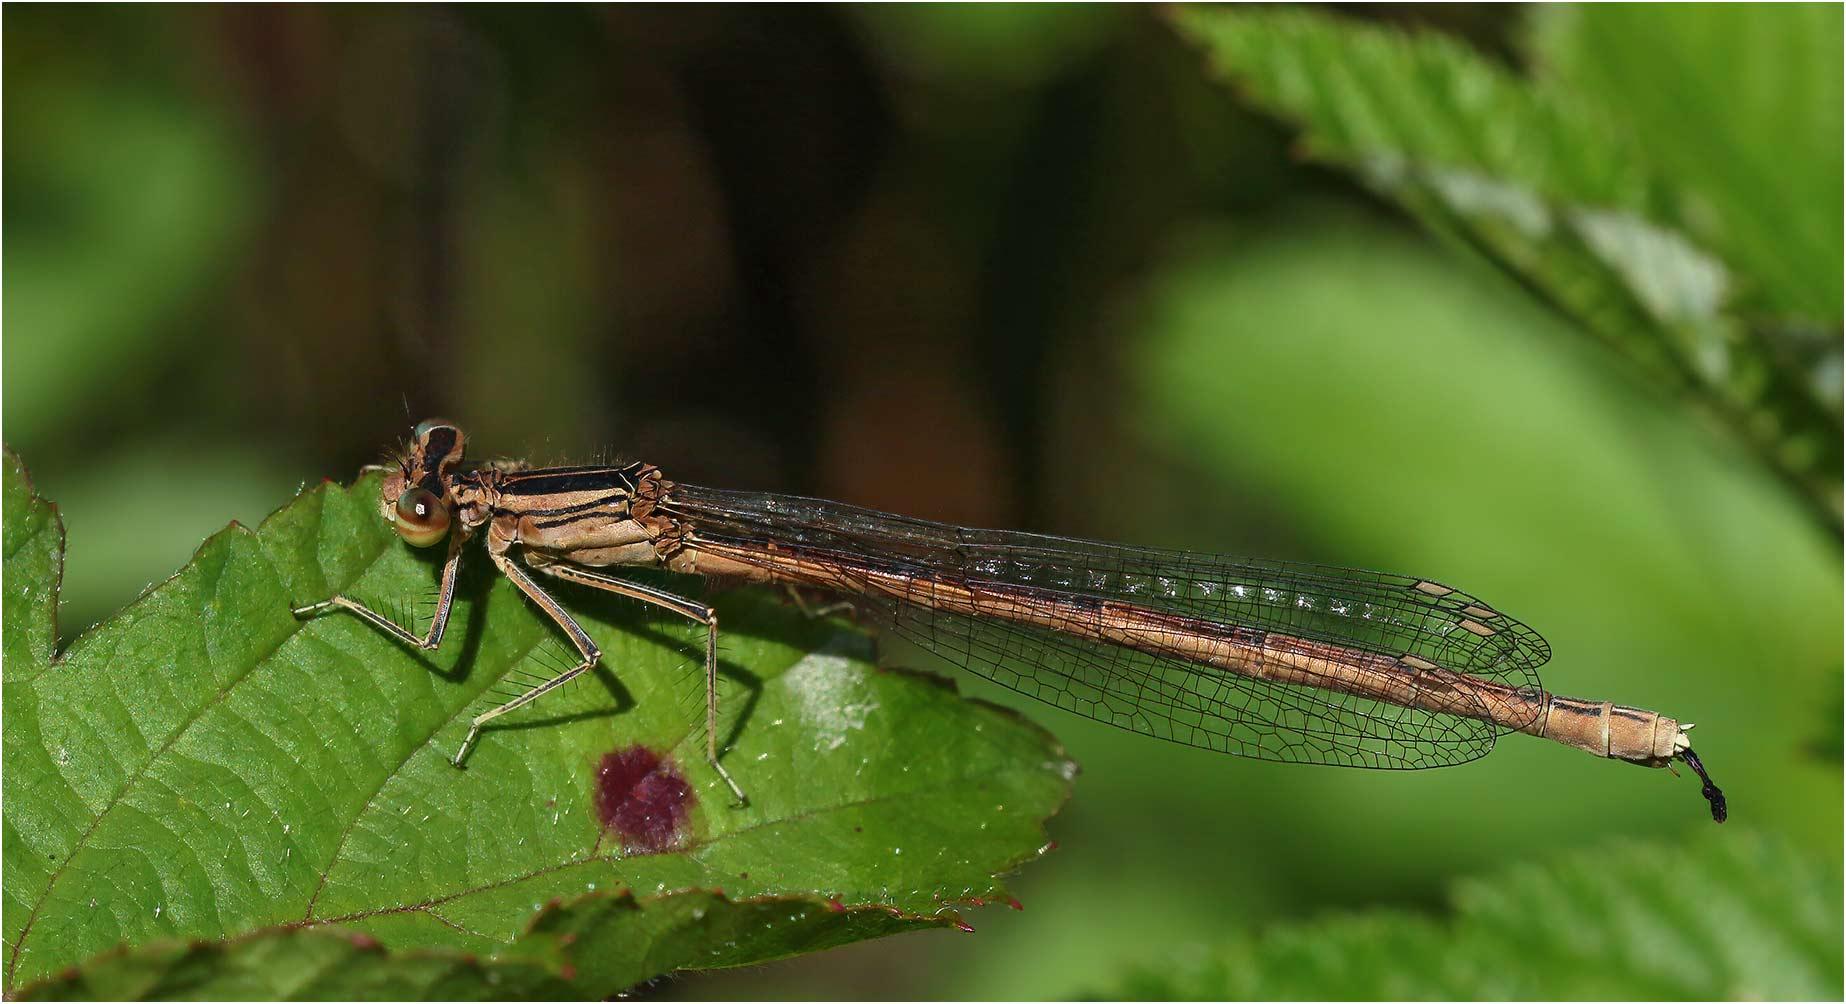 Platycnemis acutipennis femelle, Castelnau-Chalosse (France-40), 04/07/2020